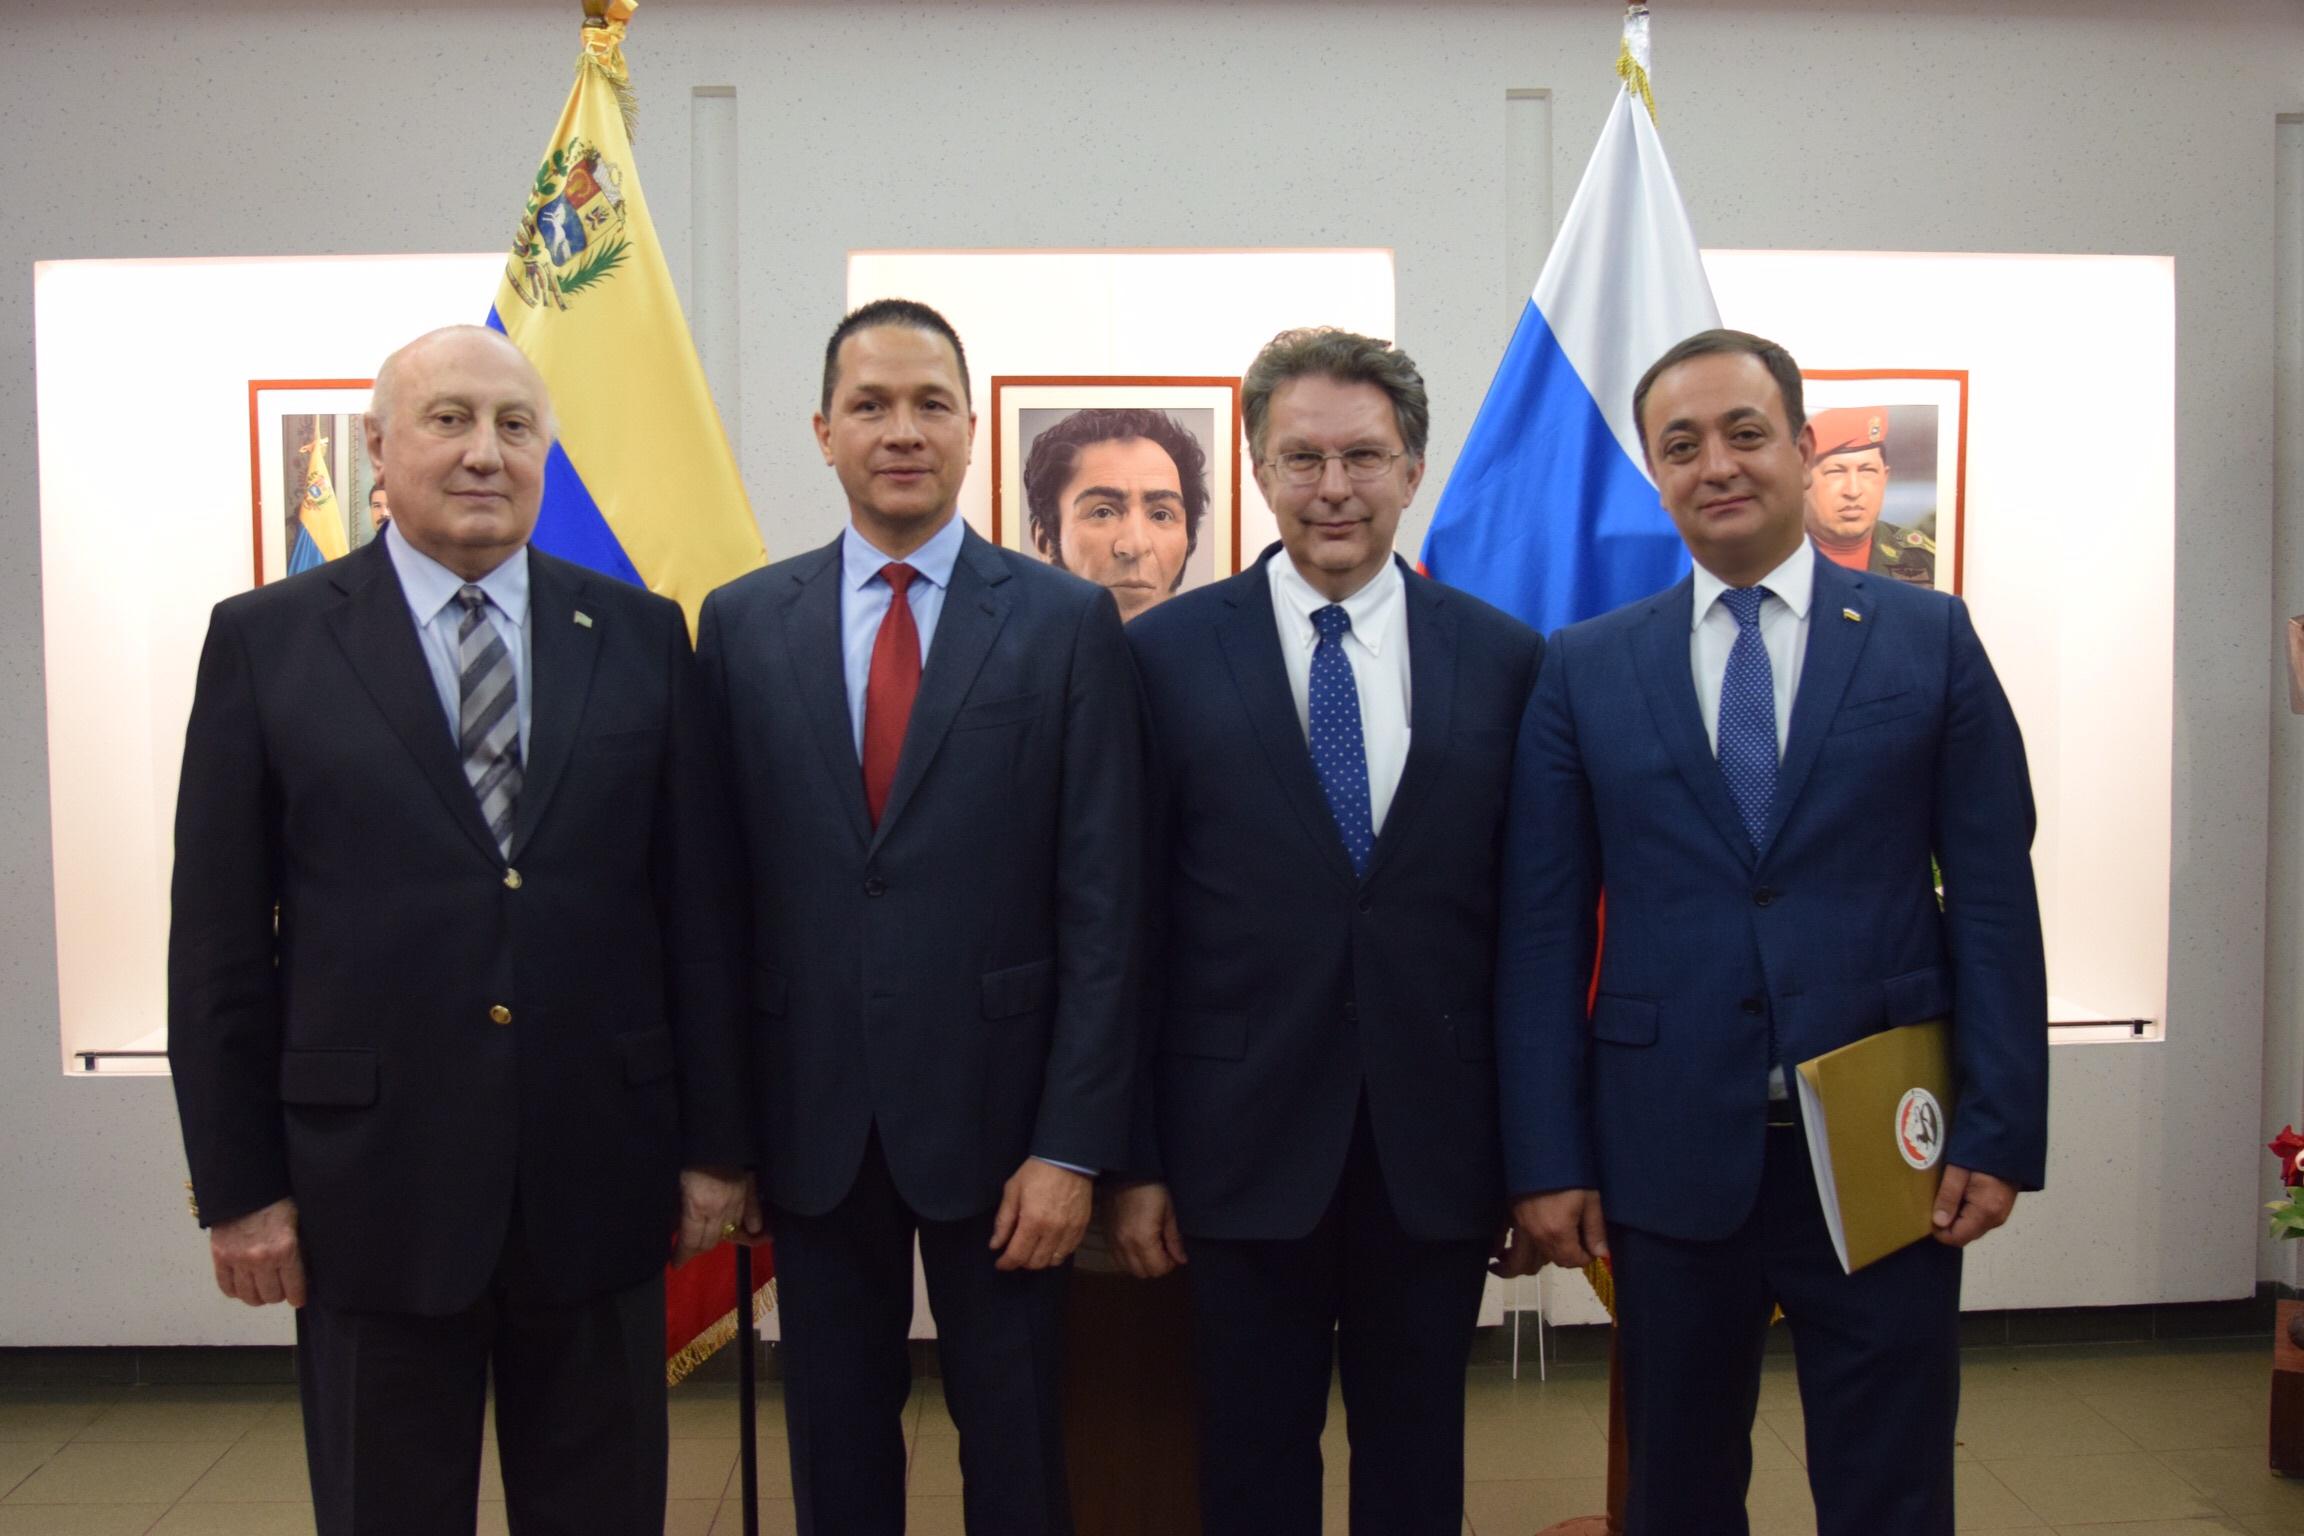 Знаур Гассиев поздравил Карлоса Тортосу с Днем Независимости